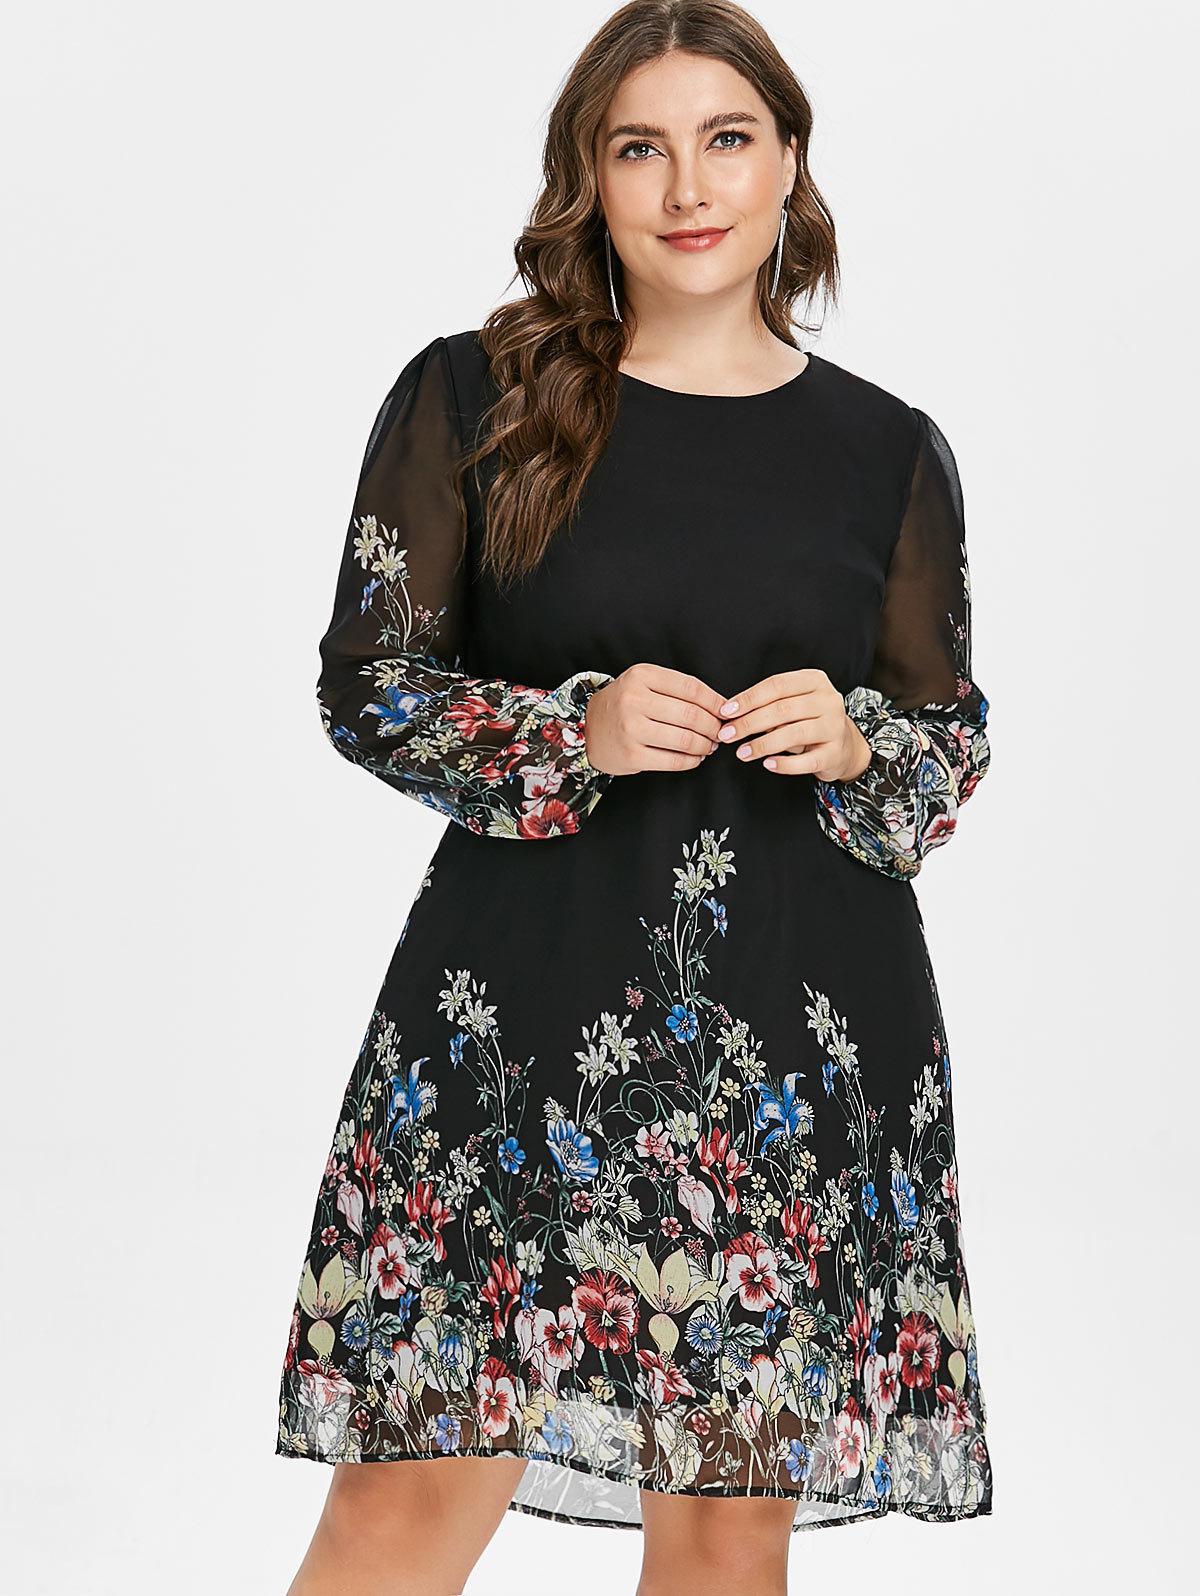 Women Dresses Plus Size Floral Print Tunic Women Dress Long Sleeve Autumn  Elegant Tribal Flower Print Vocation Shirt Dress Chiffon 5xl Party Dress ...